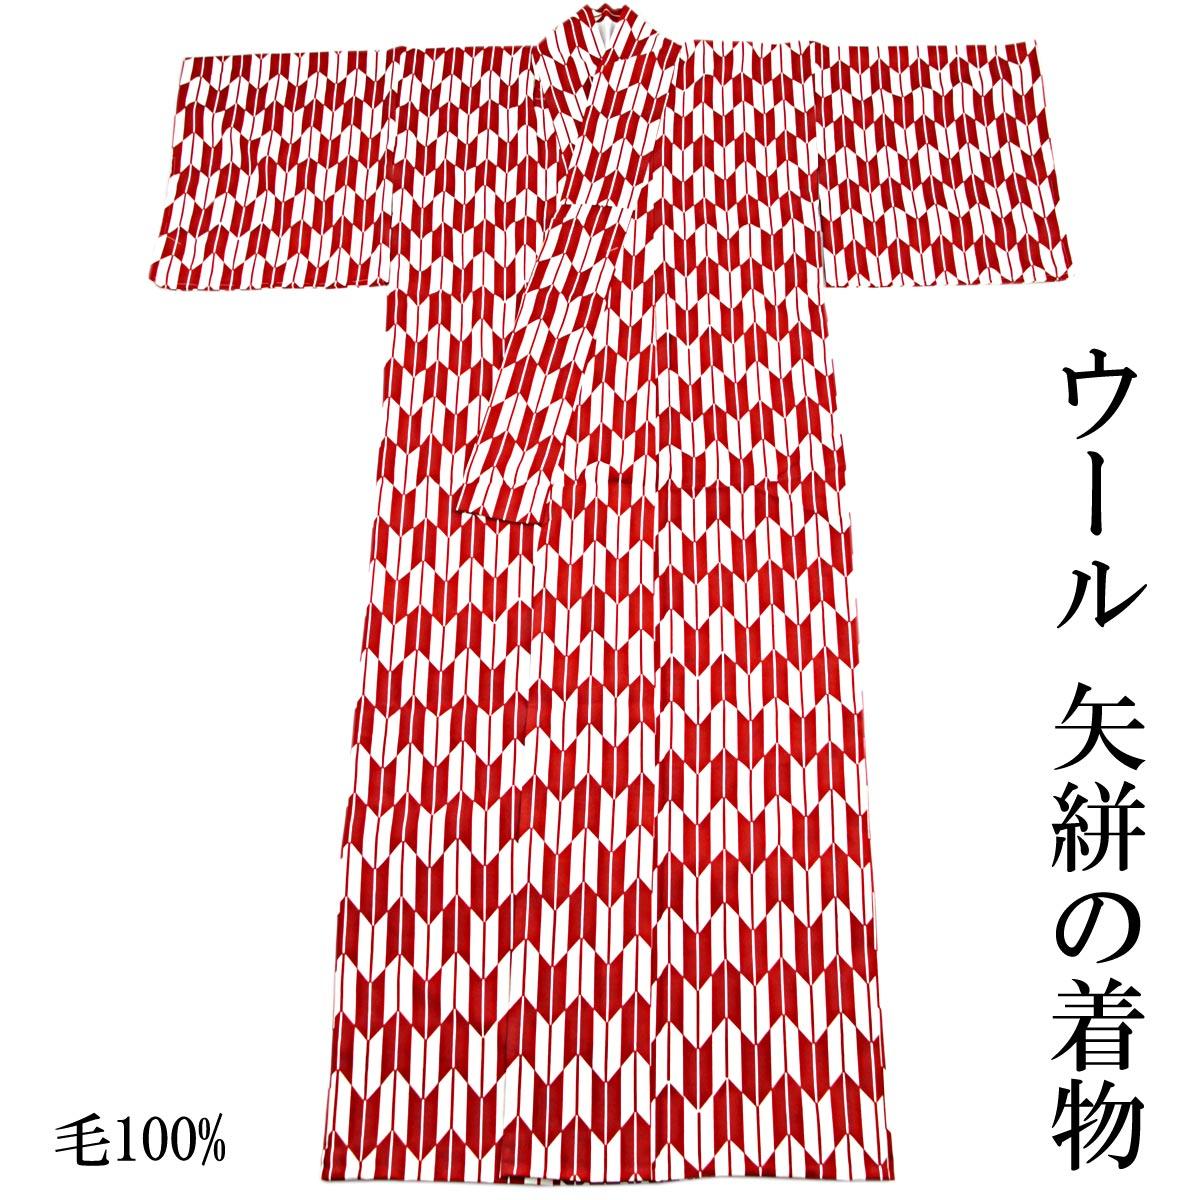 矢絣 ウール着物 -1- 女性用 普通袖丈 毛100% 赤 L-size